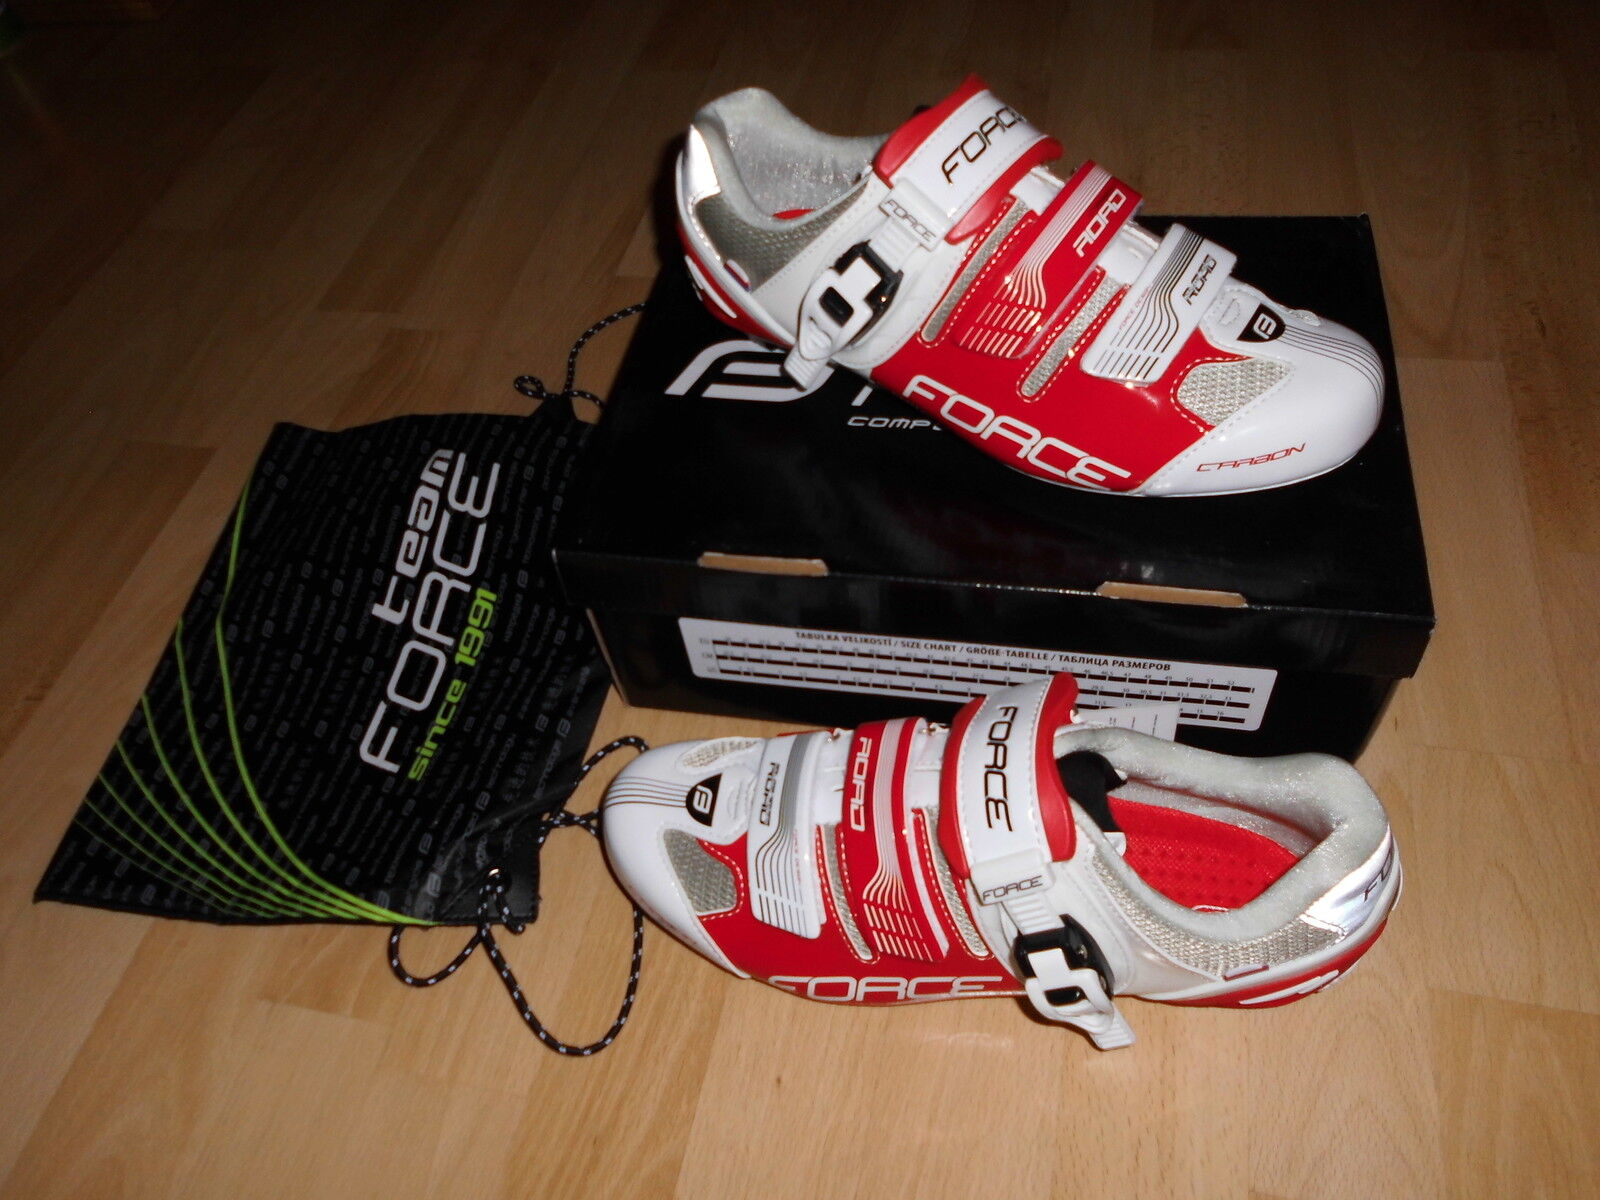 Rennrad Rennrad Rennrad Schuhe Force Carbon  road gr. 44, weiss Neu, andere   grosse  nach Frage 85db0b